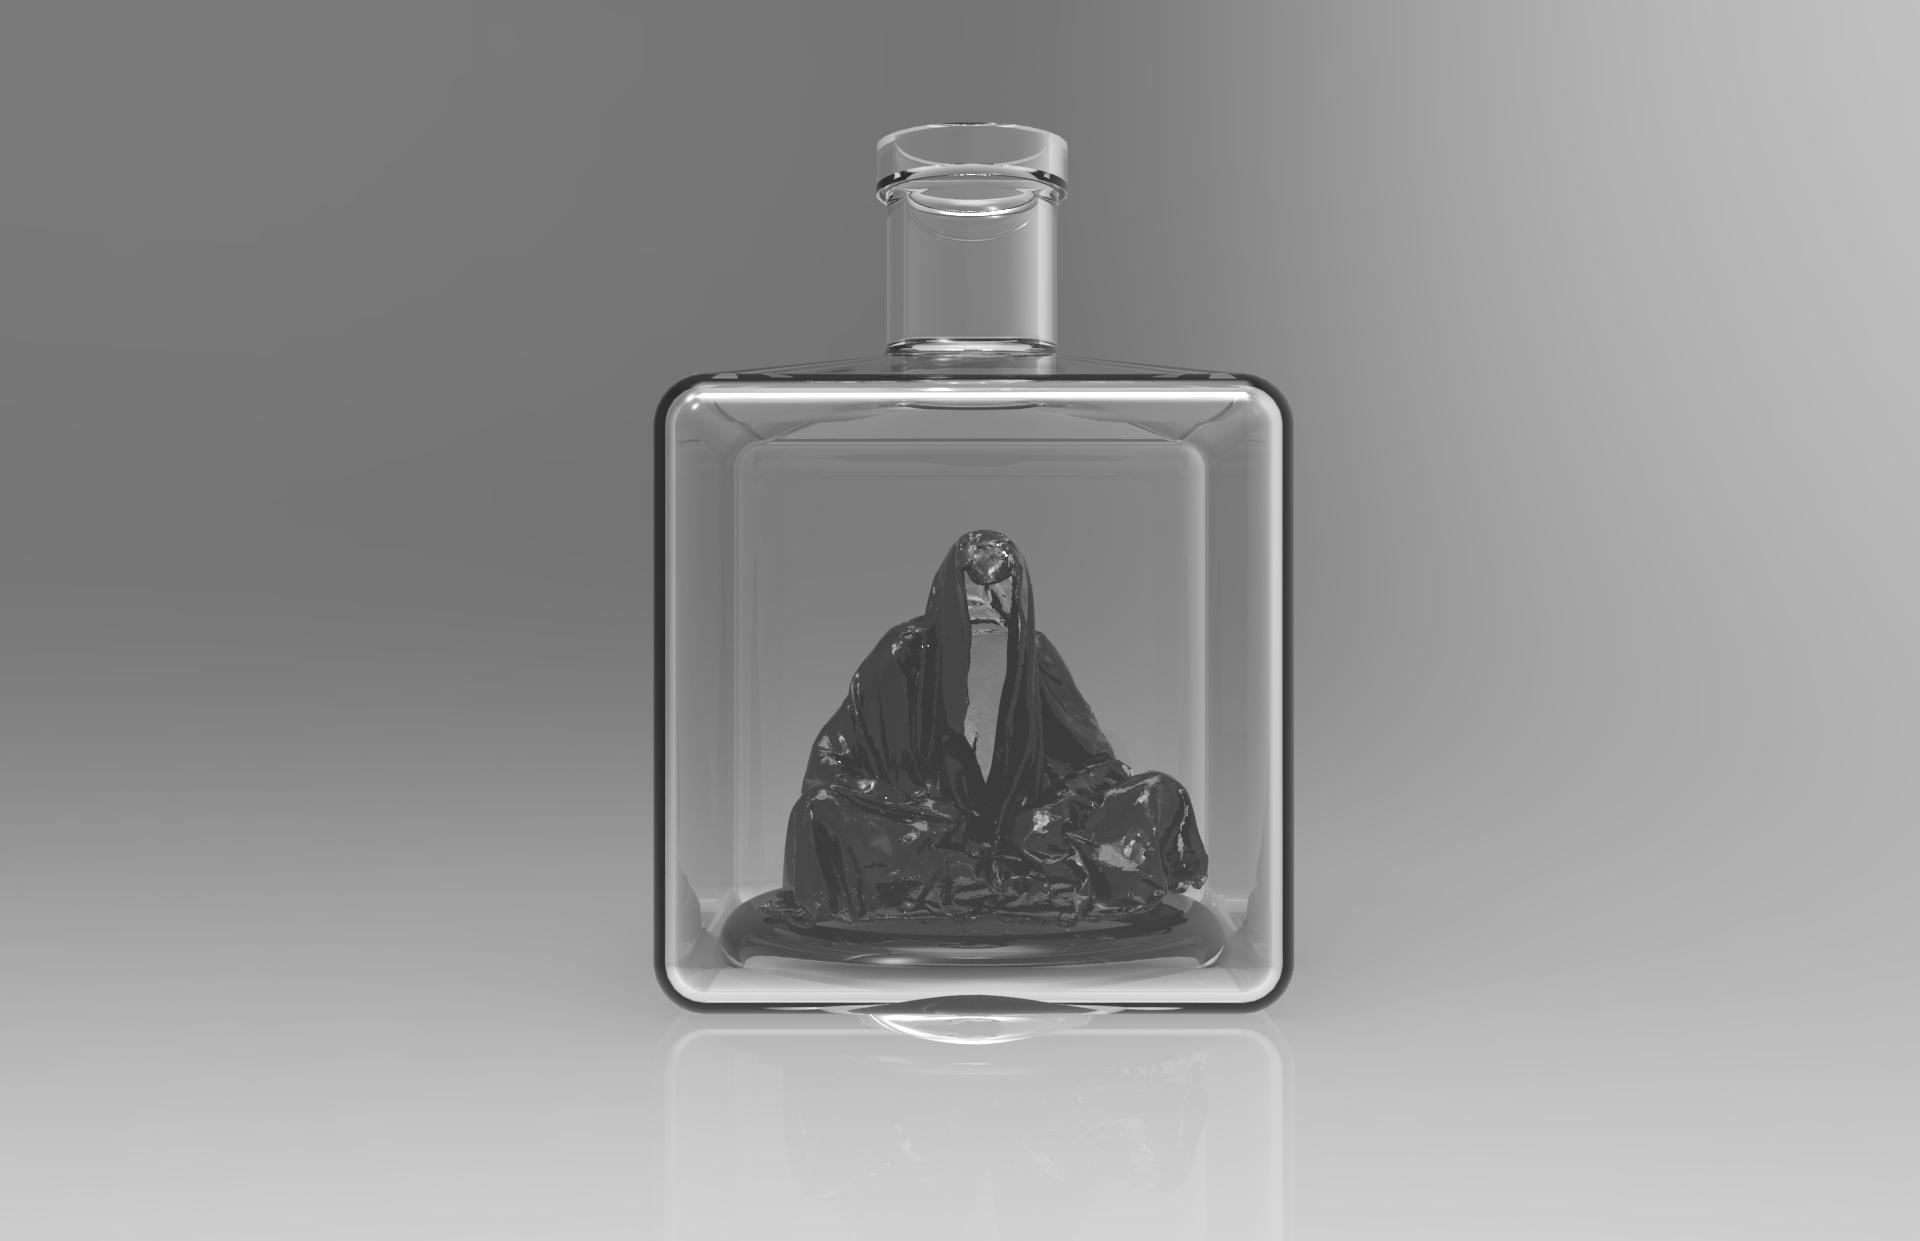 Guardian glass bottle wadka water drink manfred kili kielnhofer art arts design glass 448